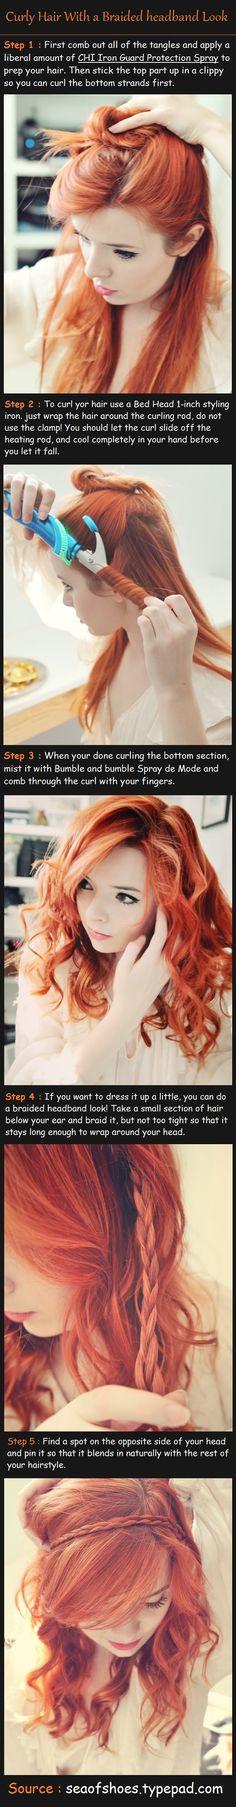 Curly Hair With a Braided headband Look